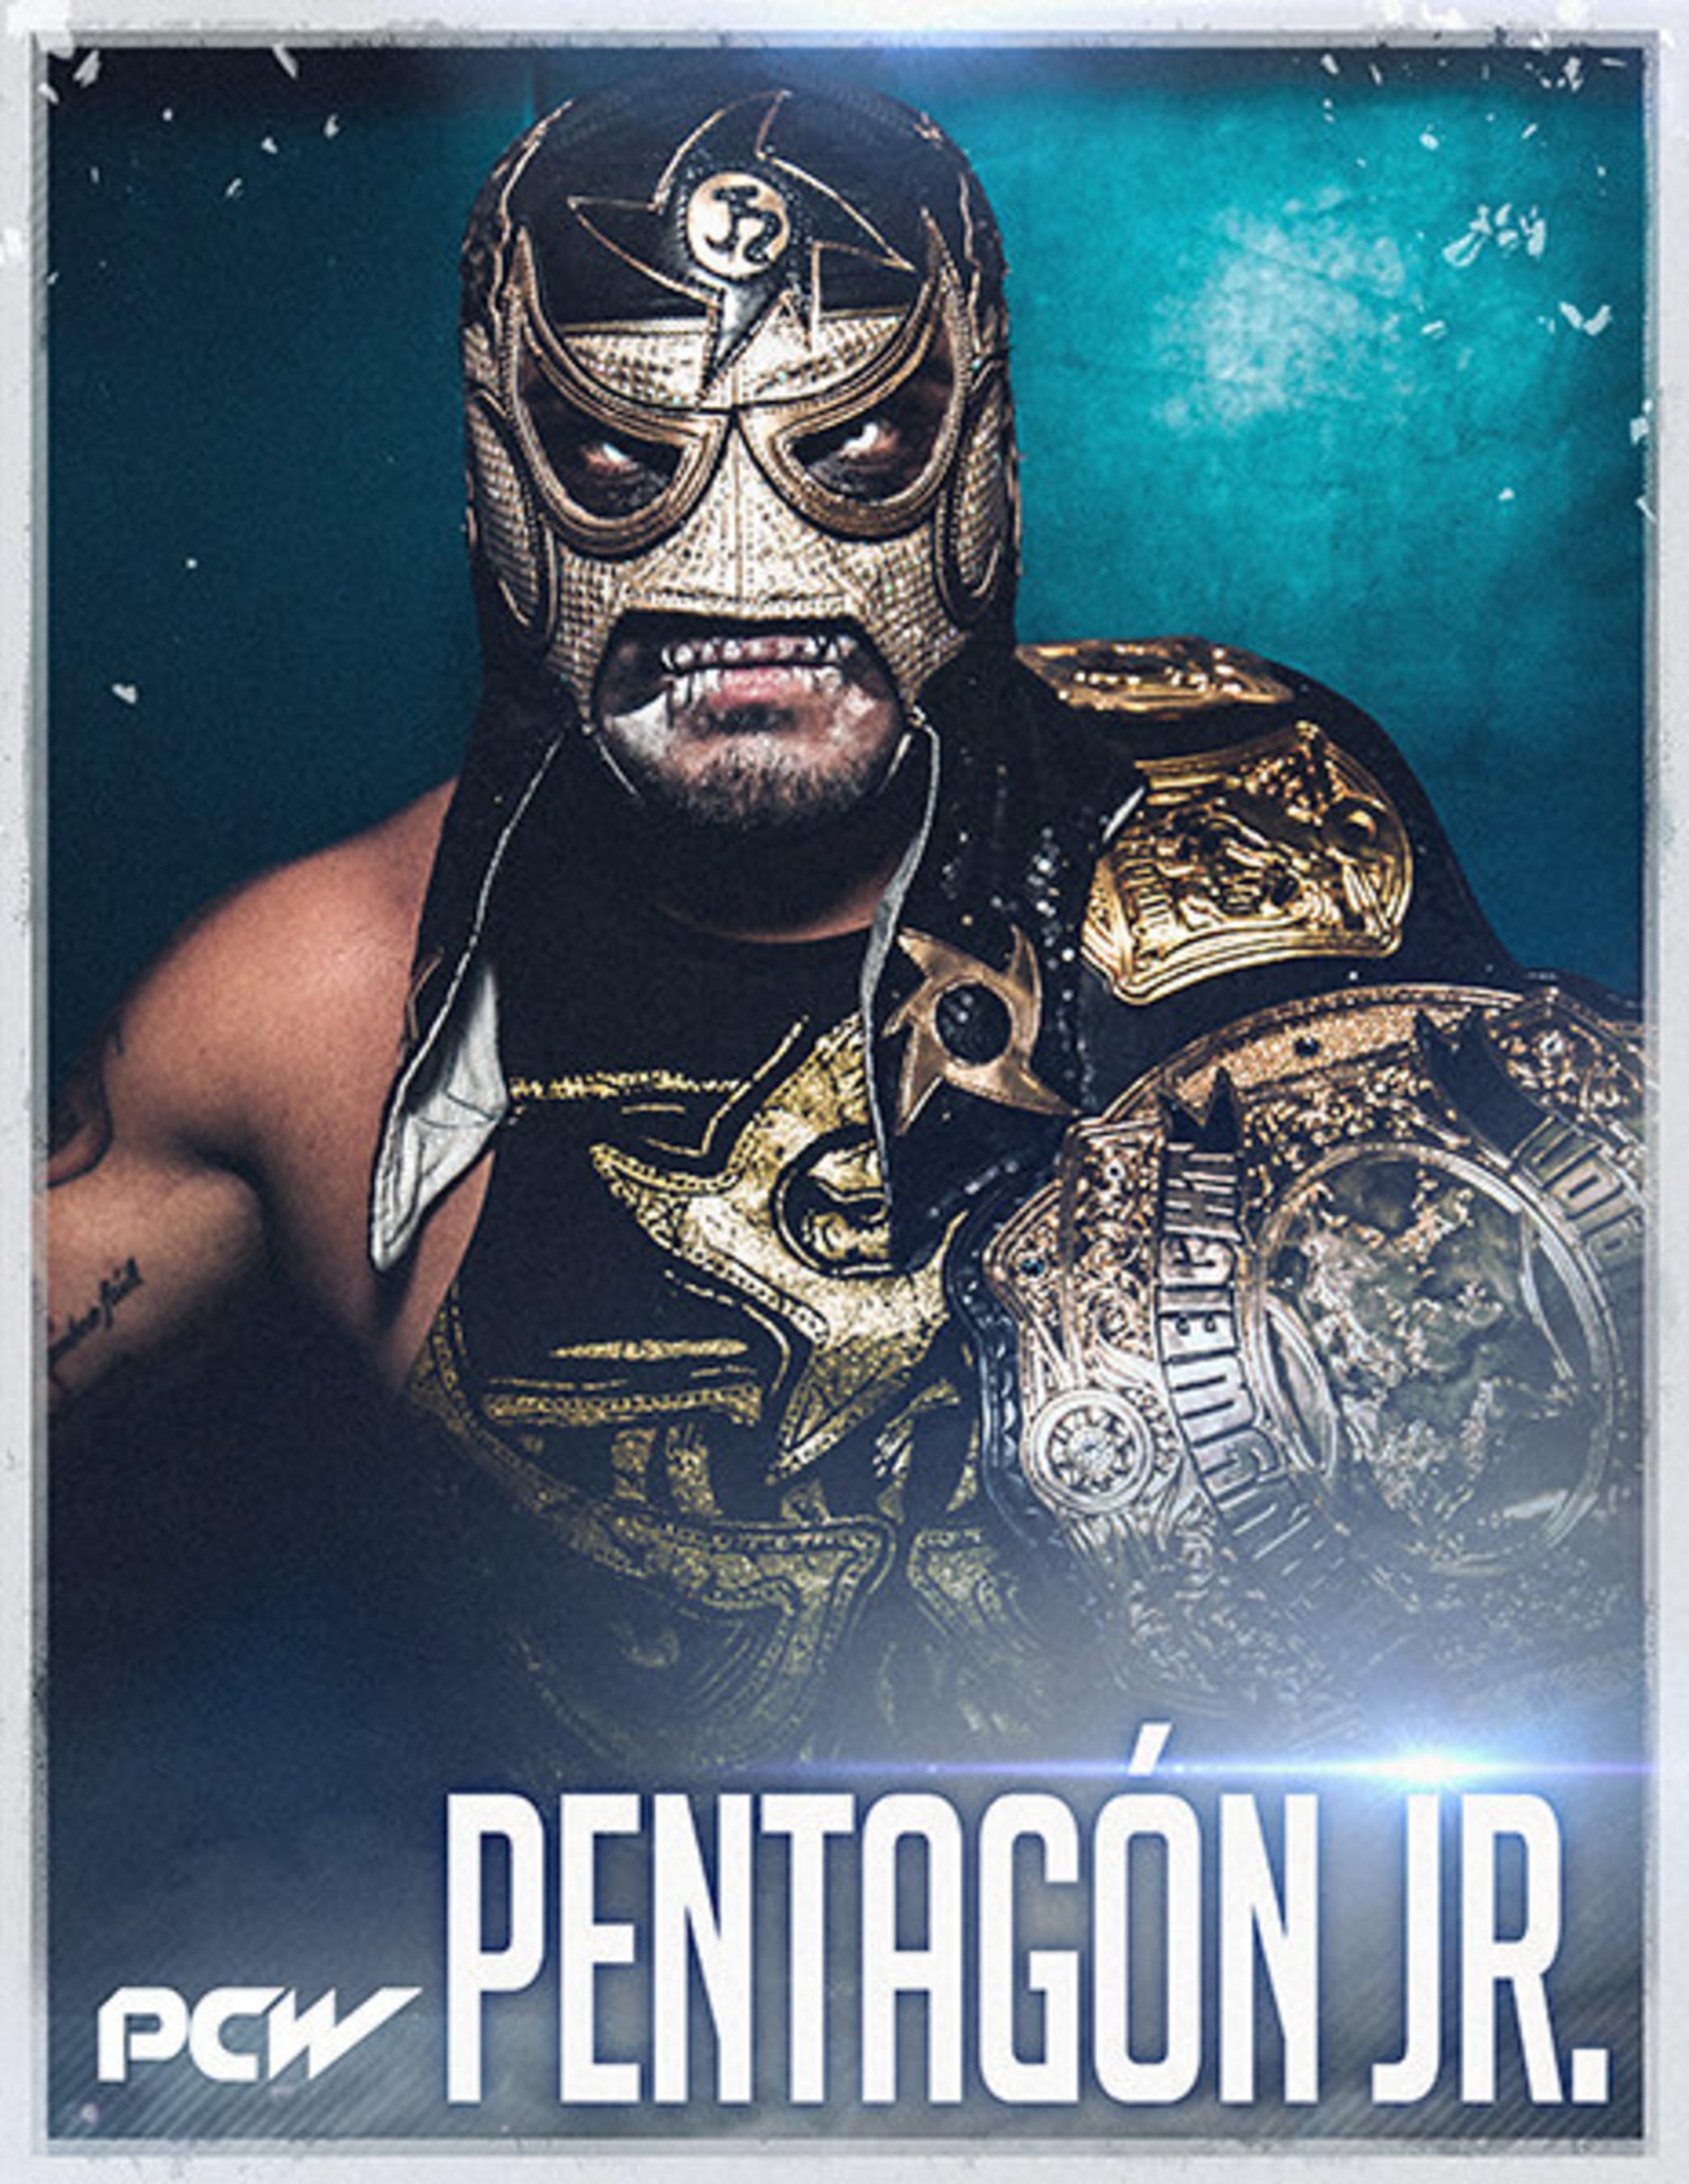 "Pacific Coast Wrestling Heavyweight Champion, Pentagon, Jr. will defend his title against wrestling legend ""RVD"" Rob Van Dam, November 12, 2016 in Torrance, CA"